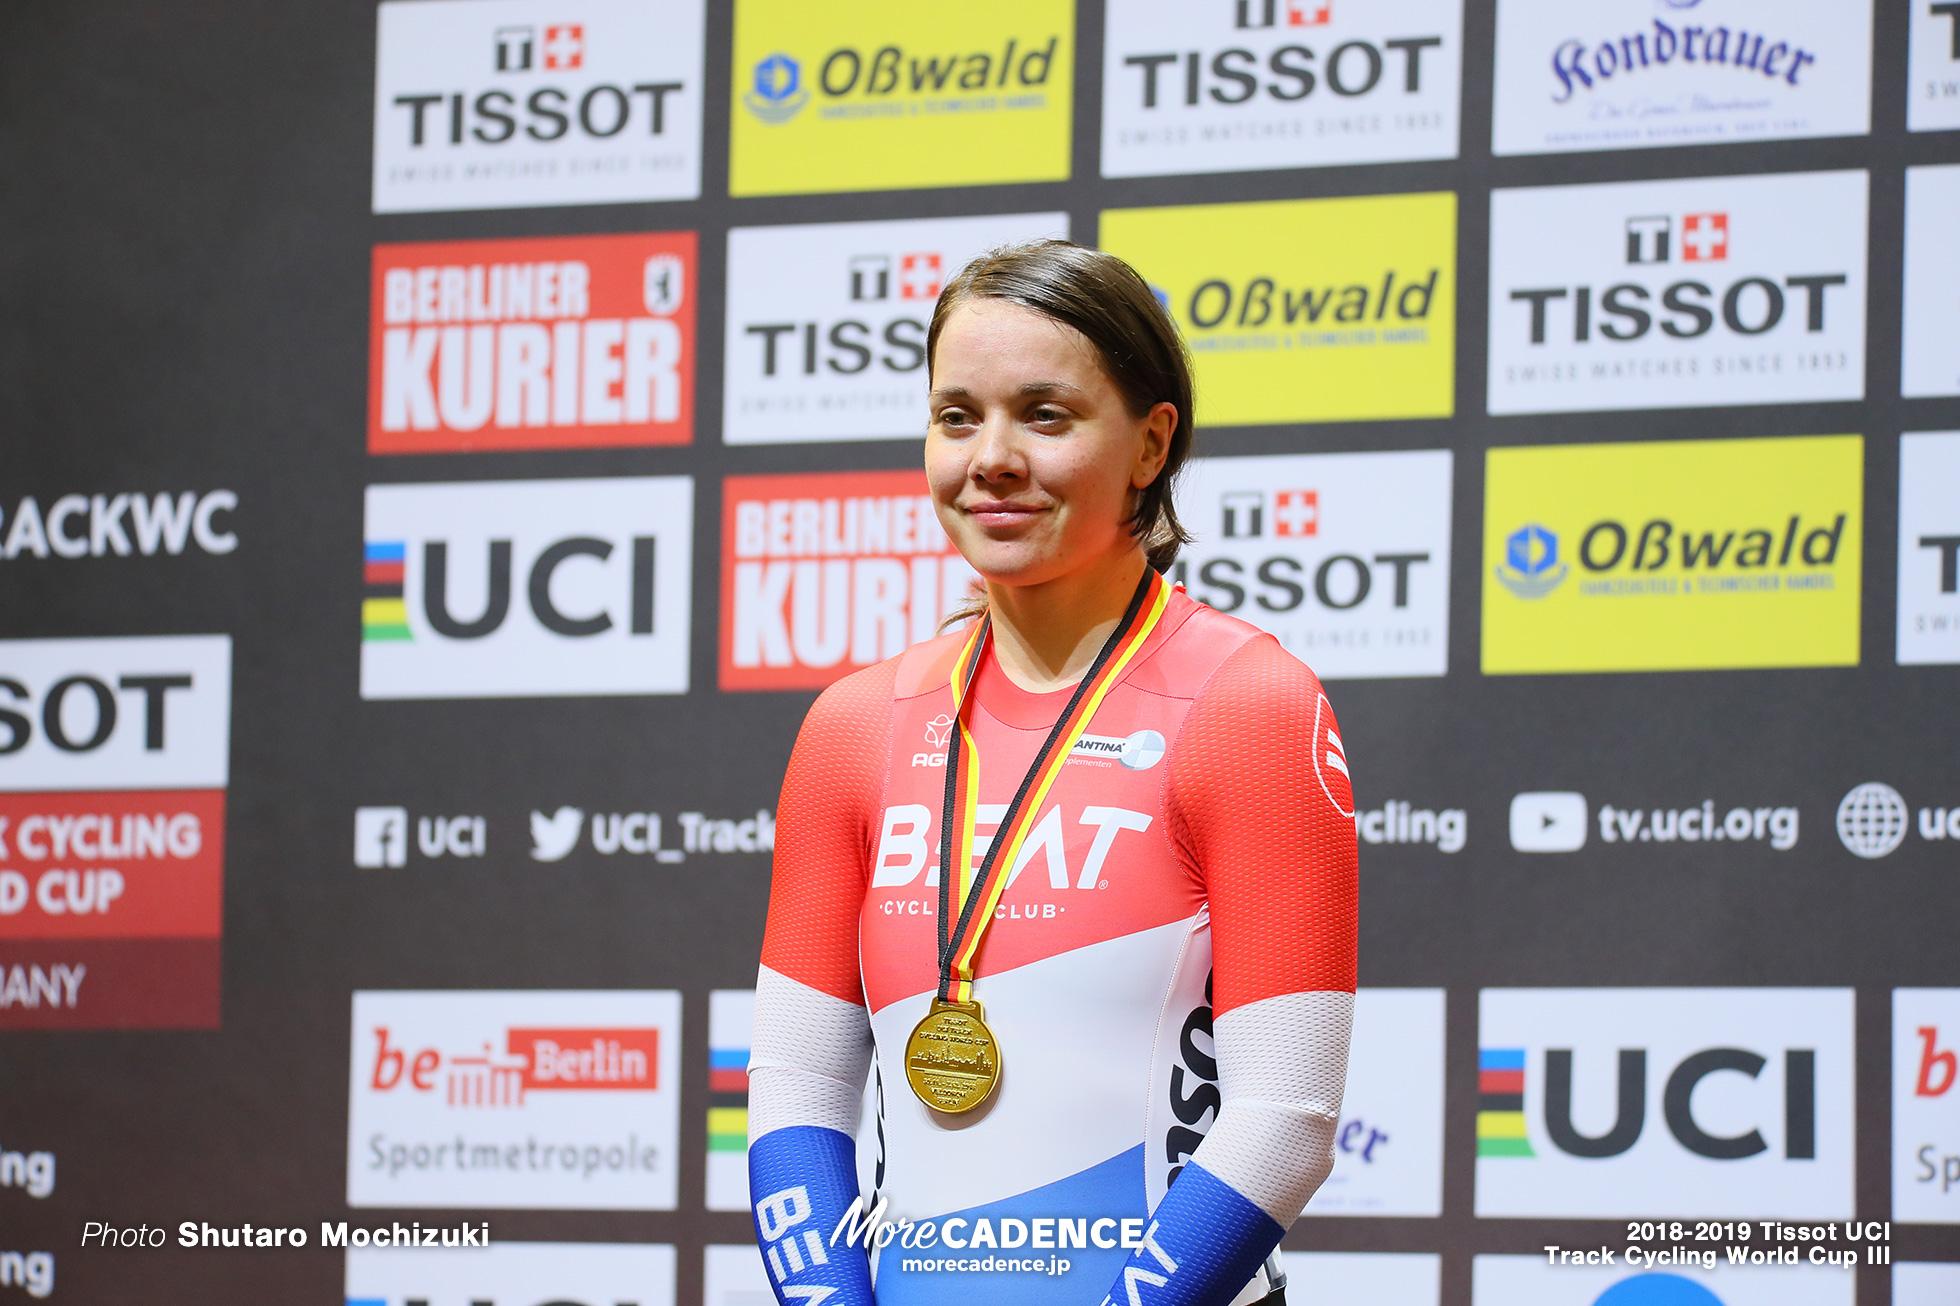 Laurine van Riessen (BEAT Cycling Club)